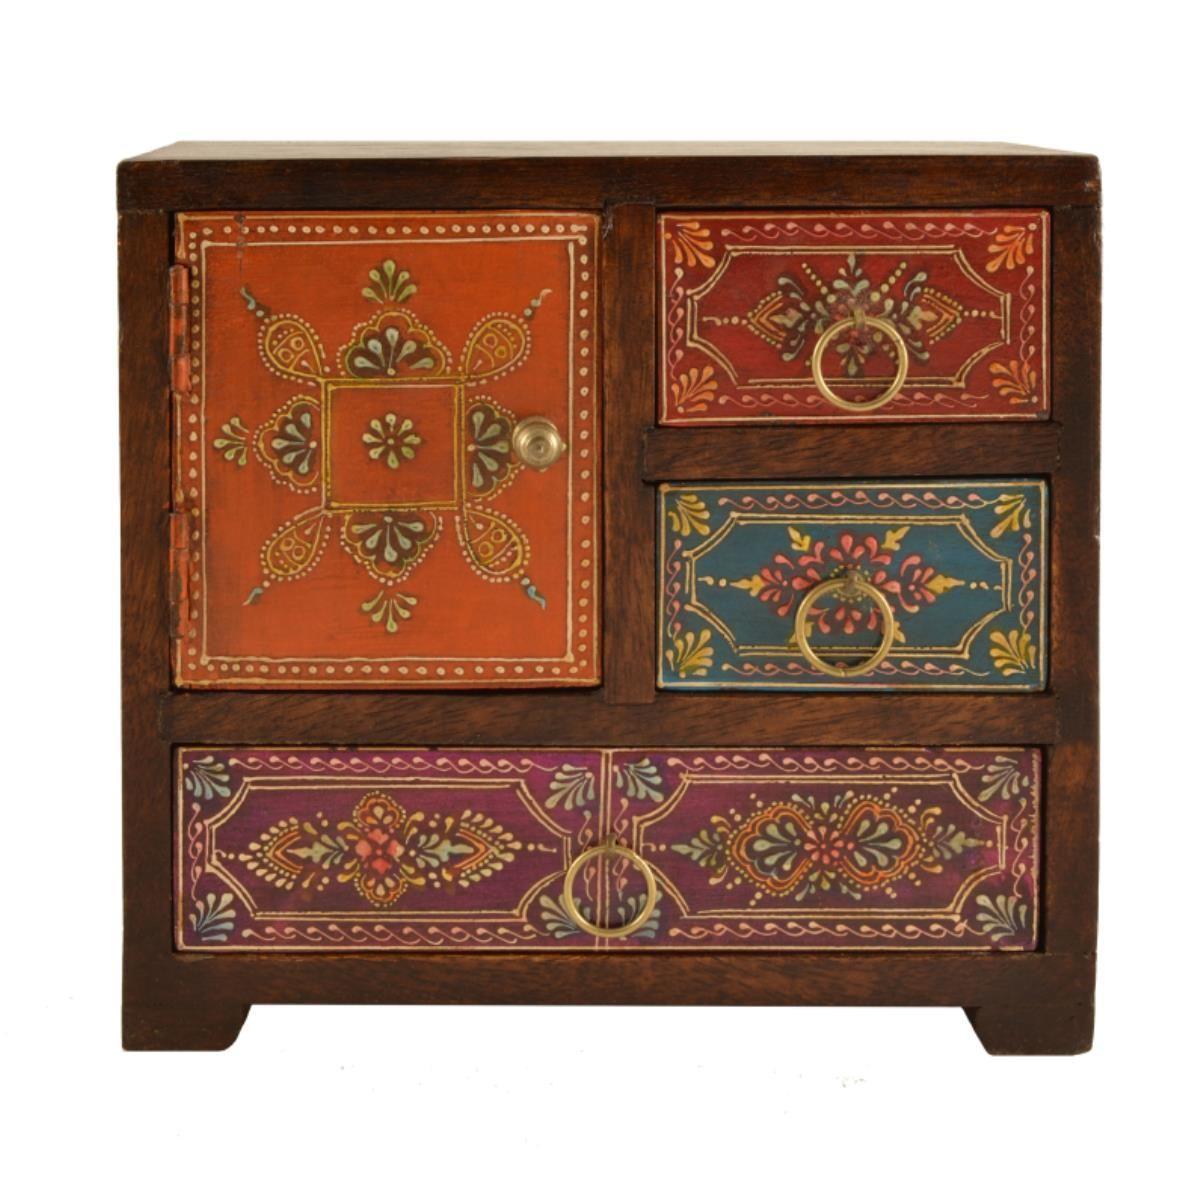 Mehindi storage chest asymmetric decoraci n turca - Muebles orientales segunda mano ...